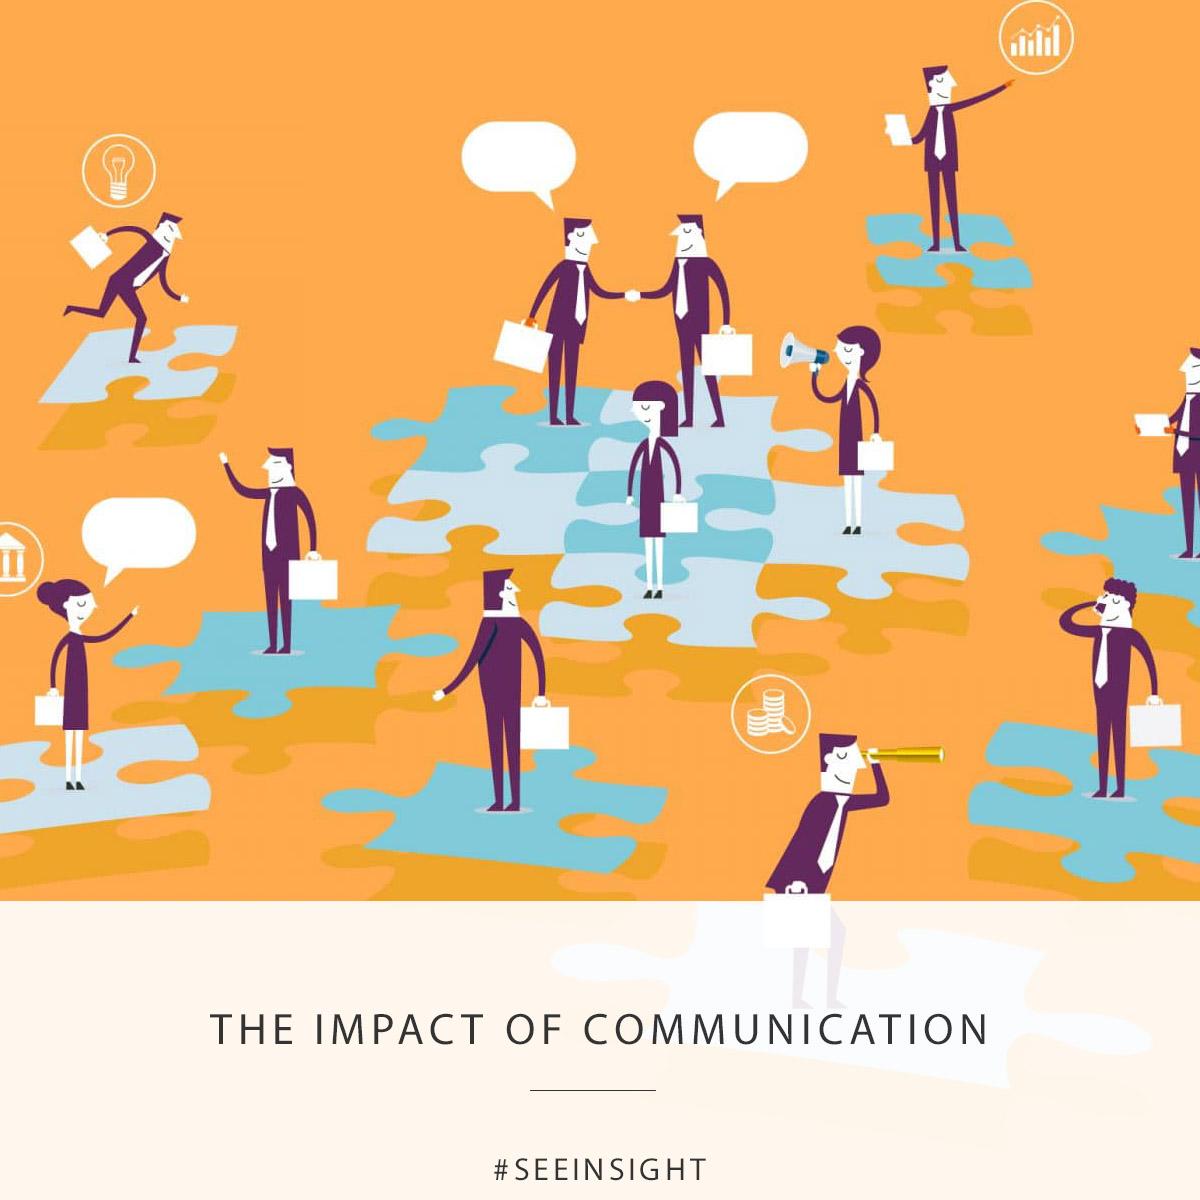 Impact of Communication